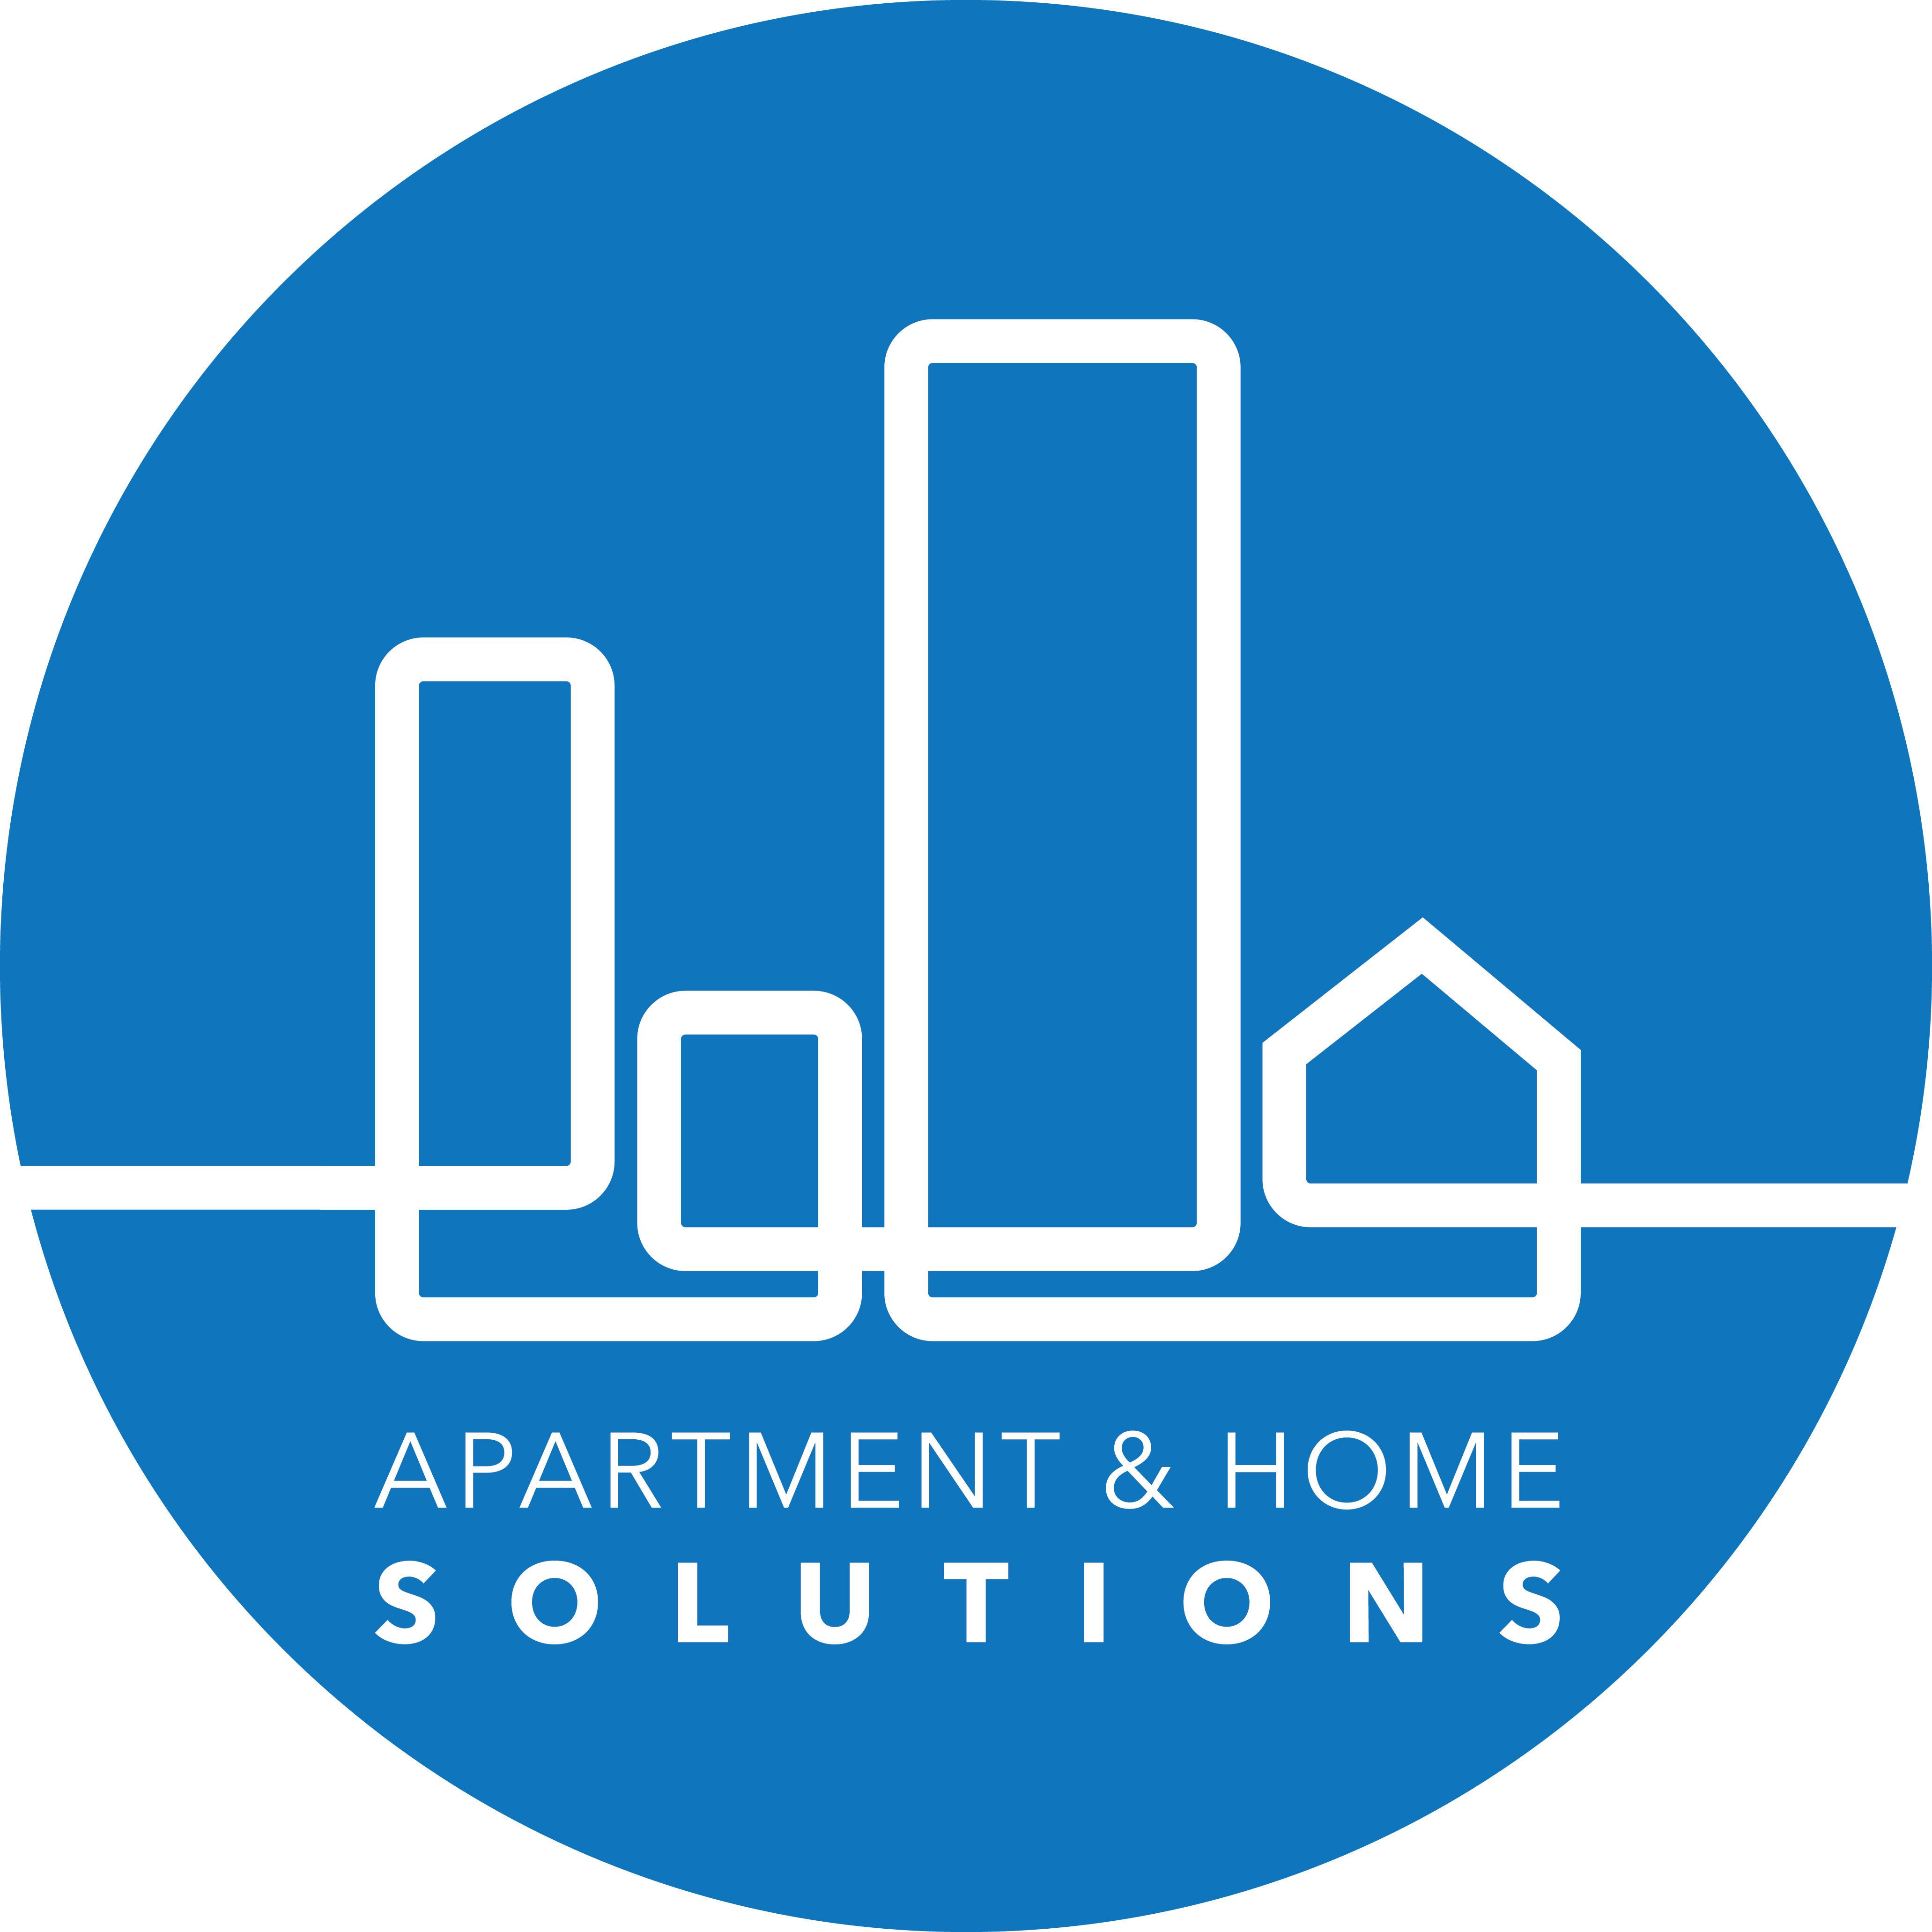 Apartment & Home Solutions In Phoenix, Az 85032